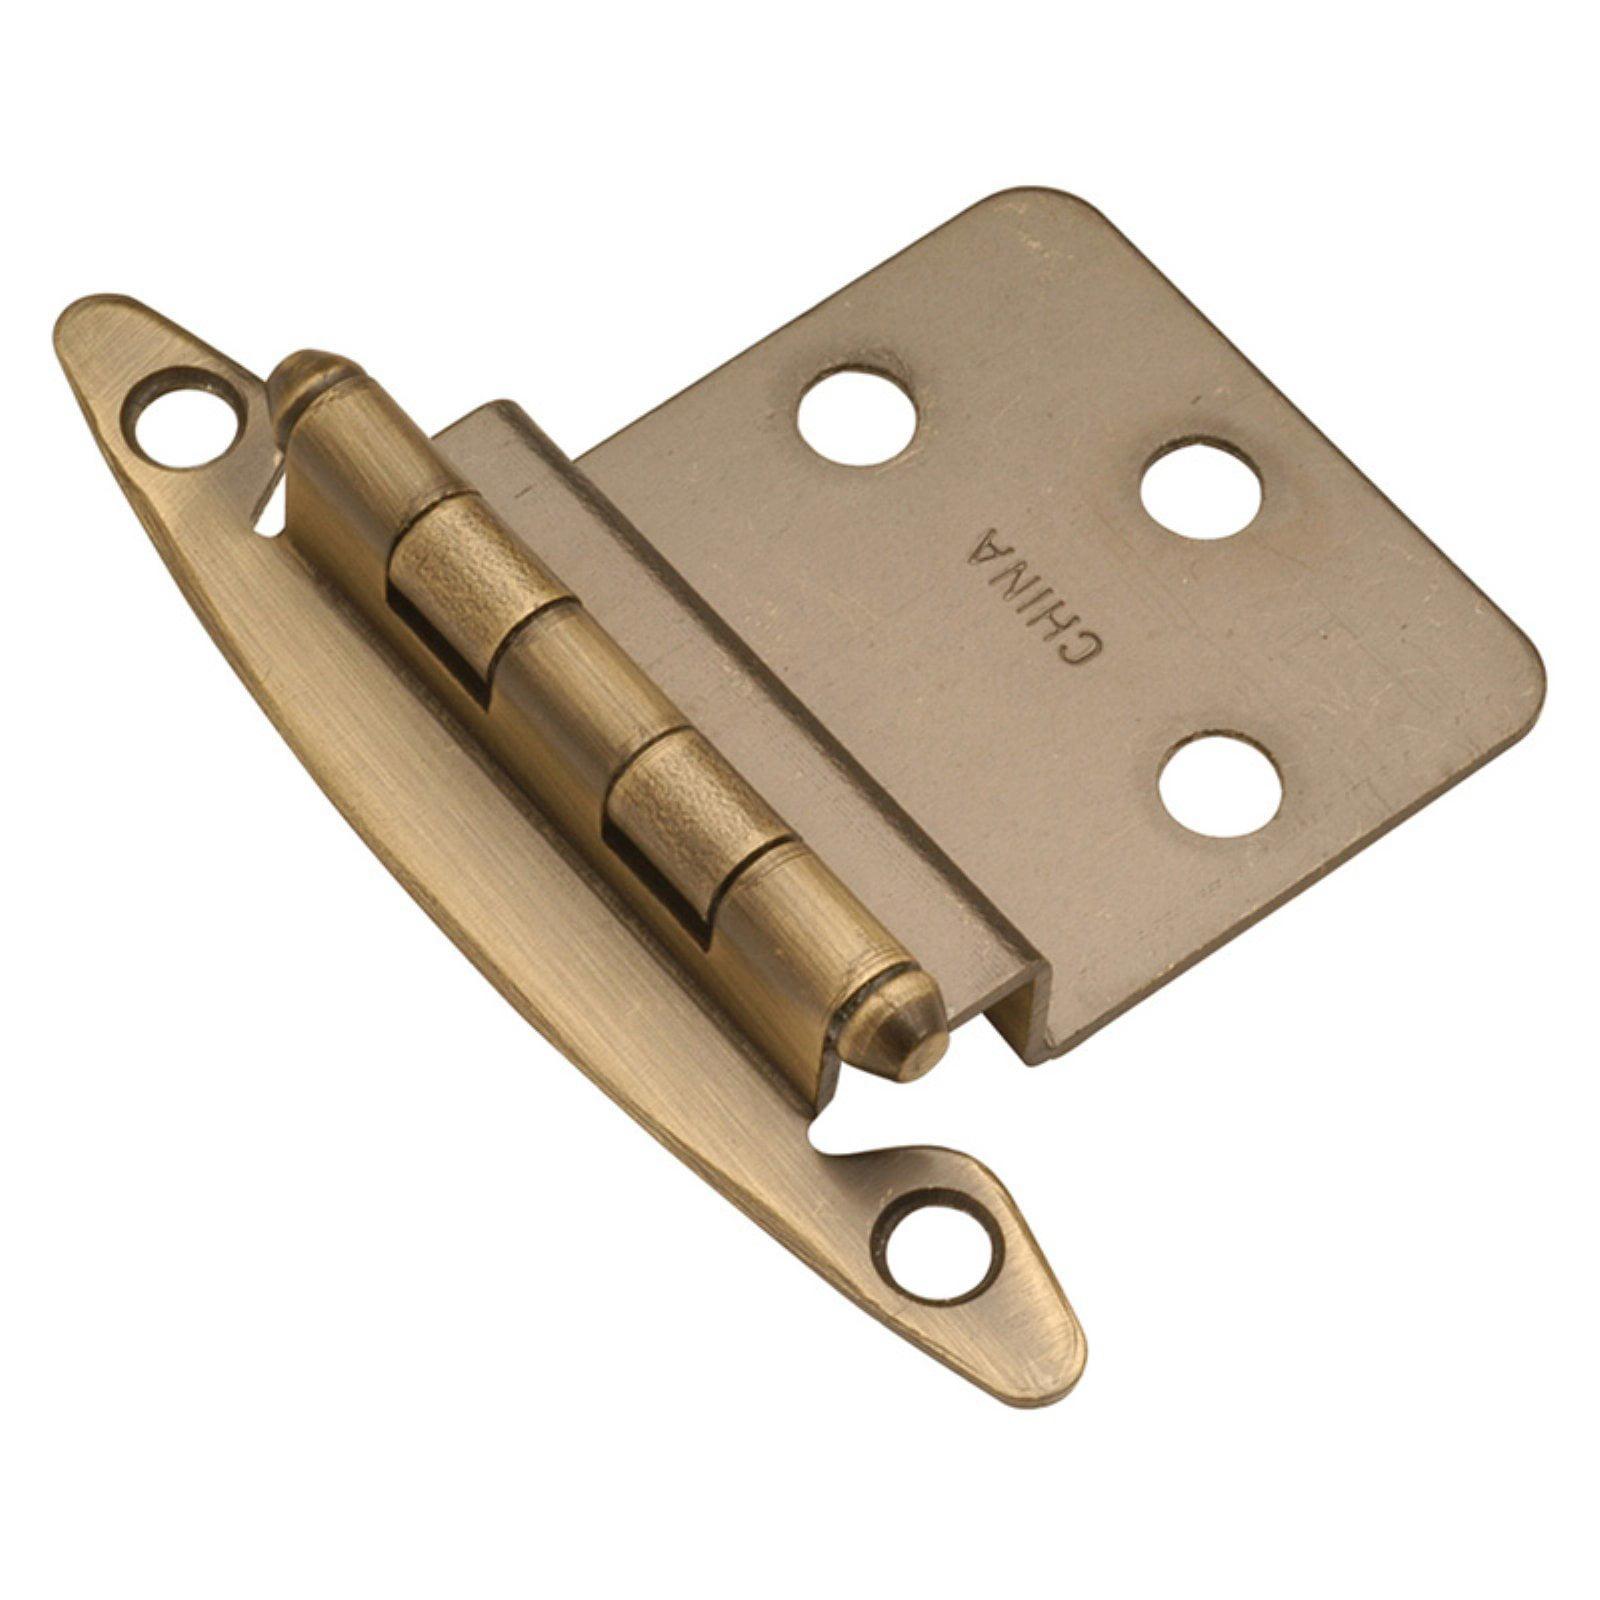 "Semi-Concealed Flush Mount 0.38"" Offset Hinge (Pack of 2) - Finish: Antique Brass"